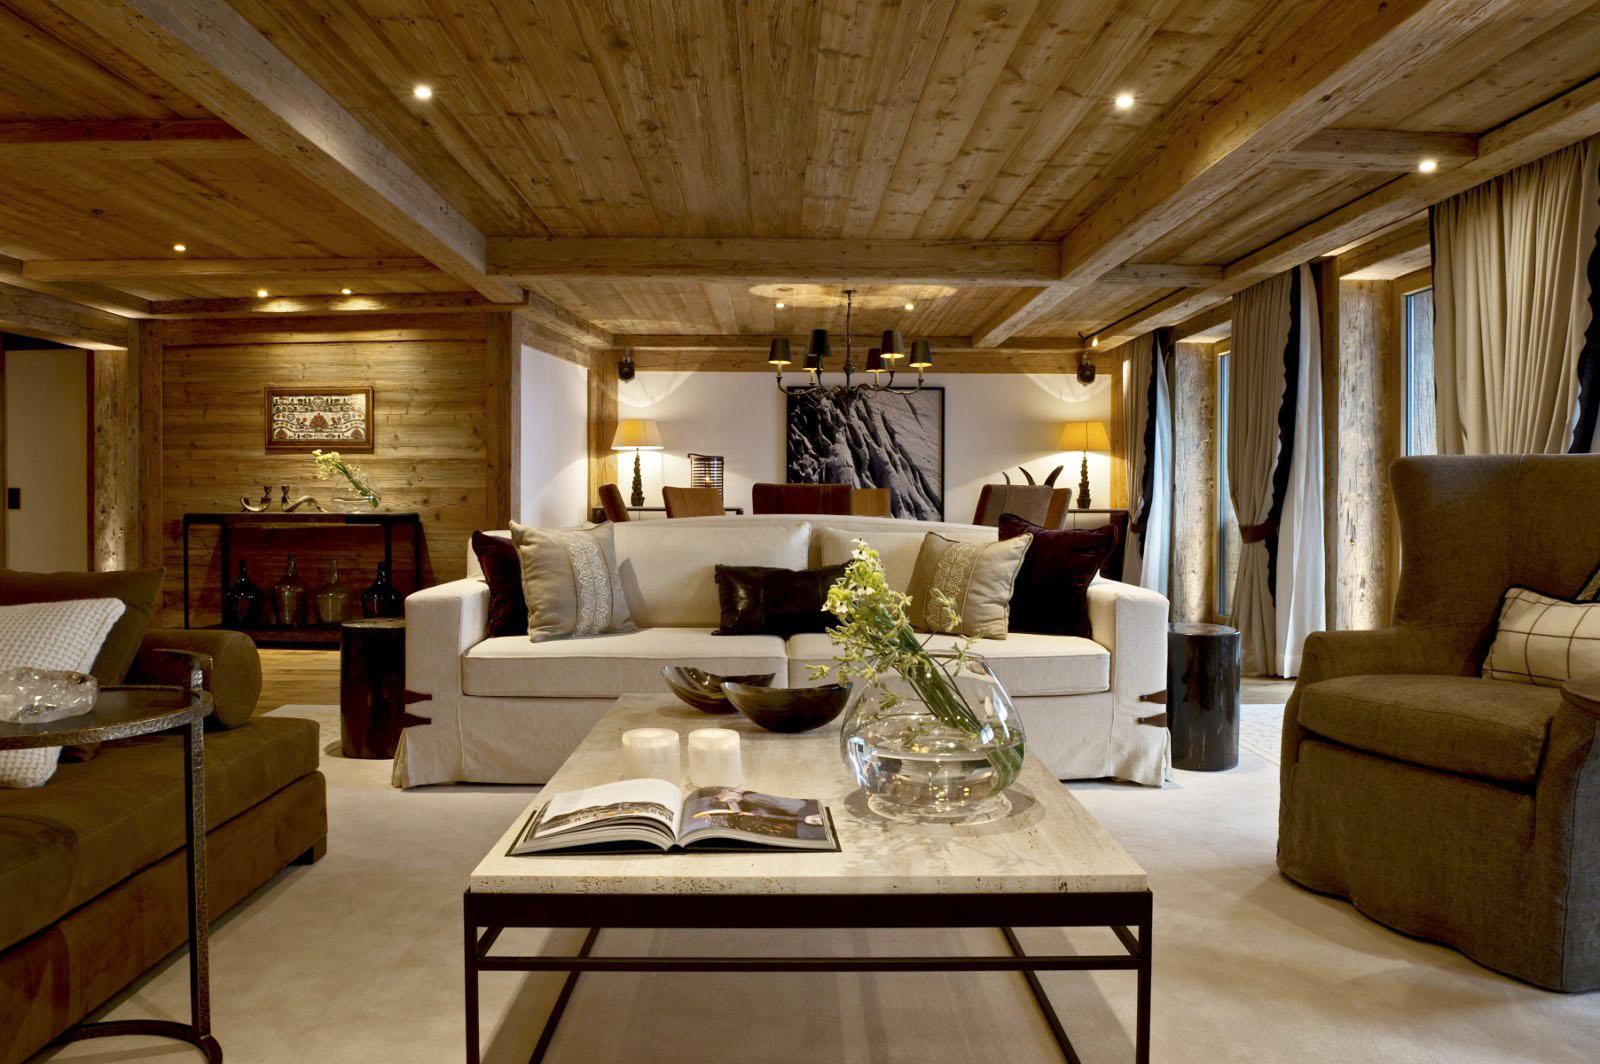 Swiss Alpine Luxury At The Alpina Gstaad Hotel  iDesignArch  Interior Design Architecture